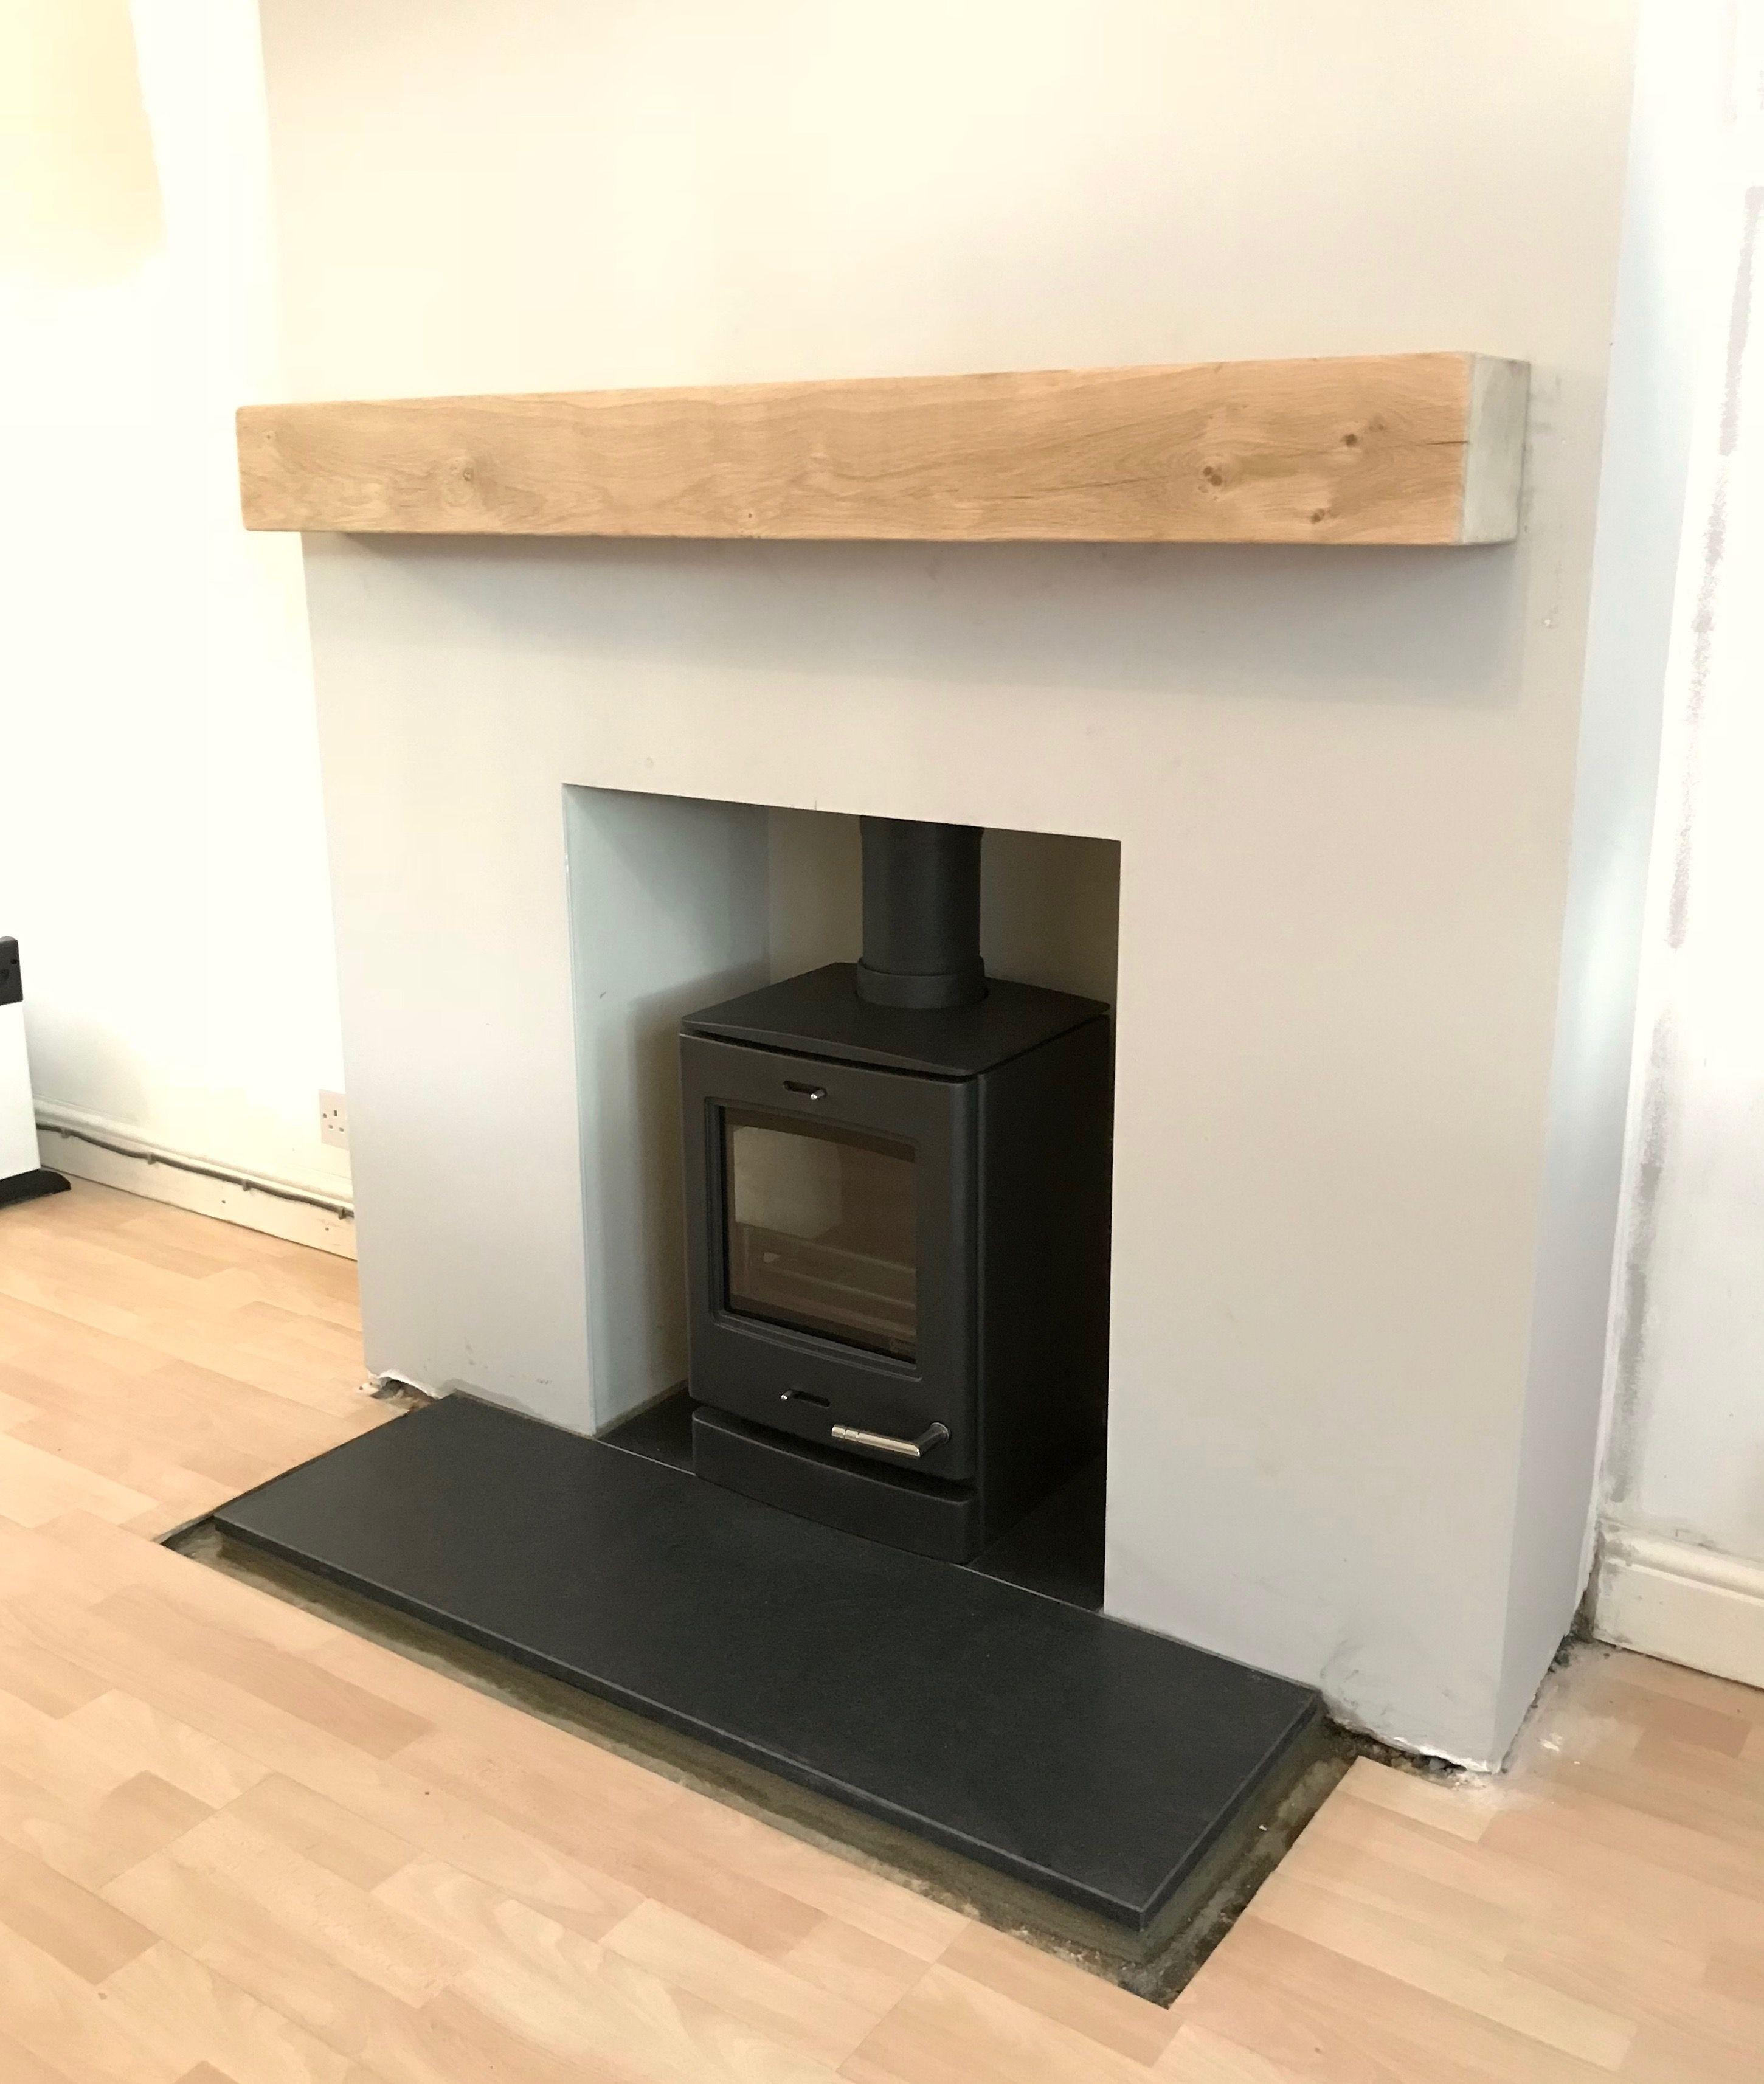 yeoman cl3 multifuel stove antiqued granite hearth solid oak beam